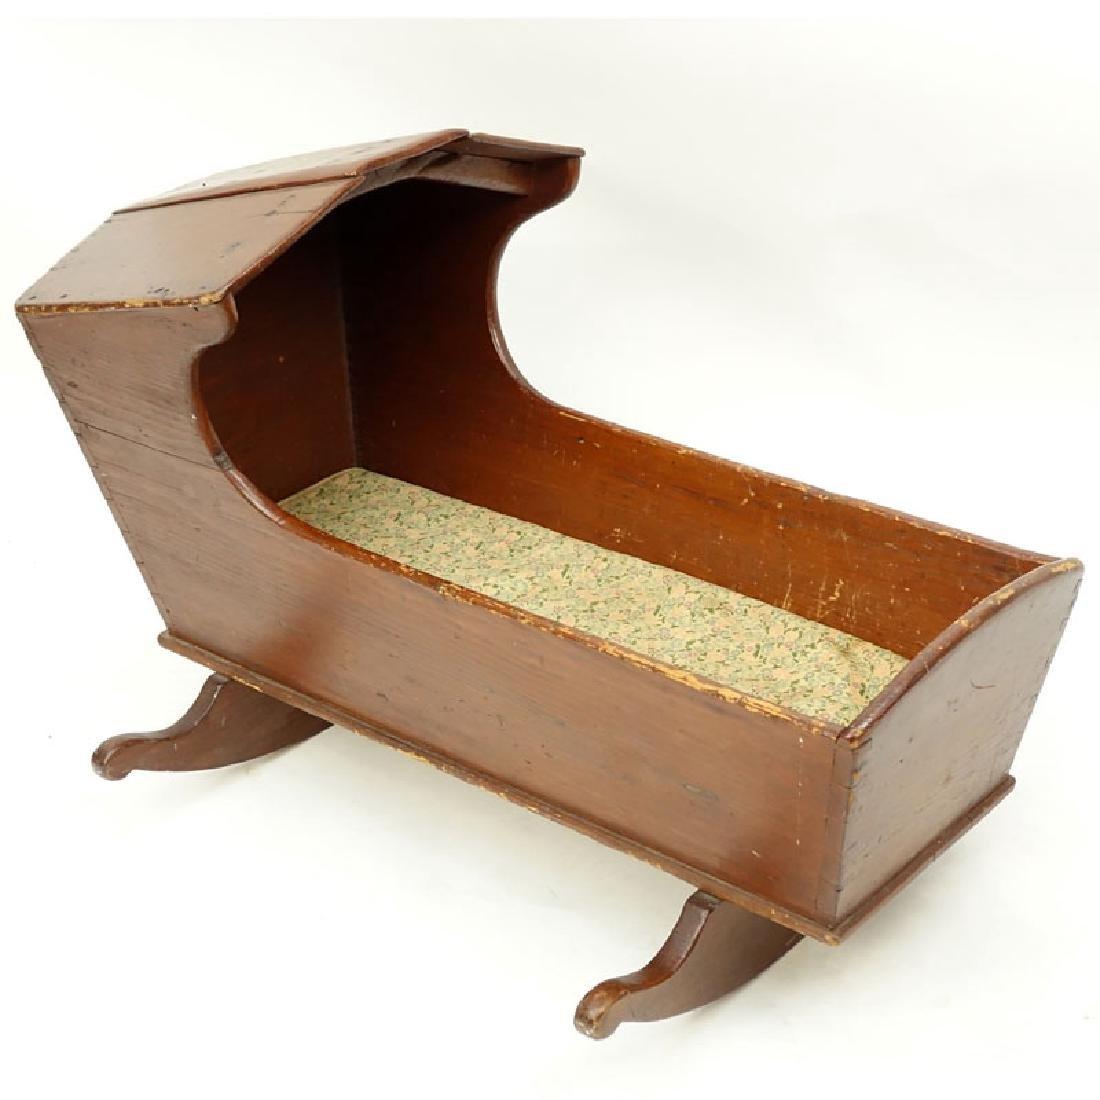 Antique American Wood Cradle. Unsigned. Wear, splits